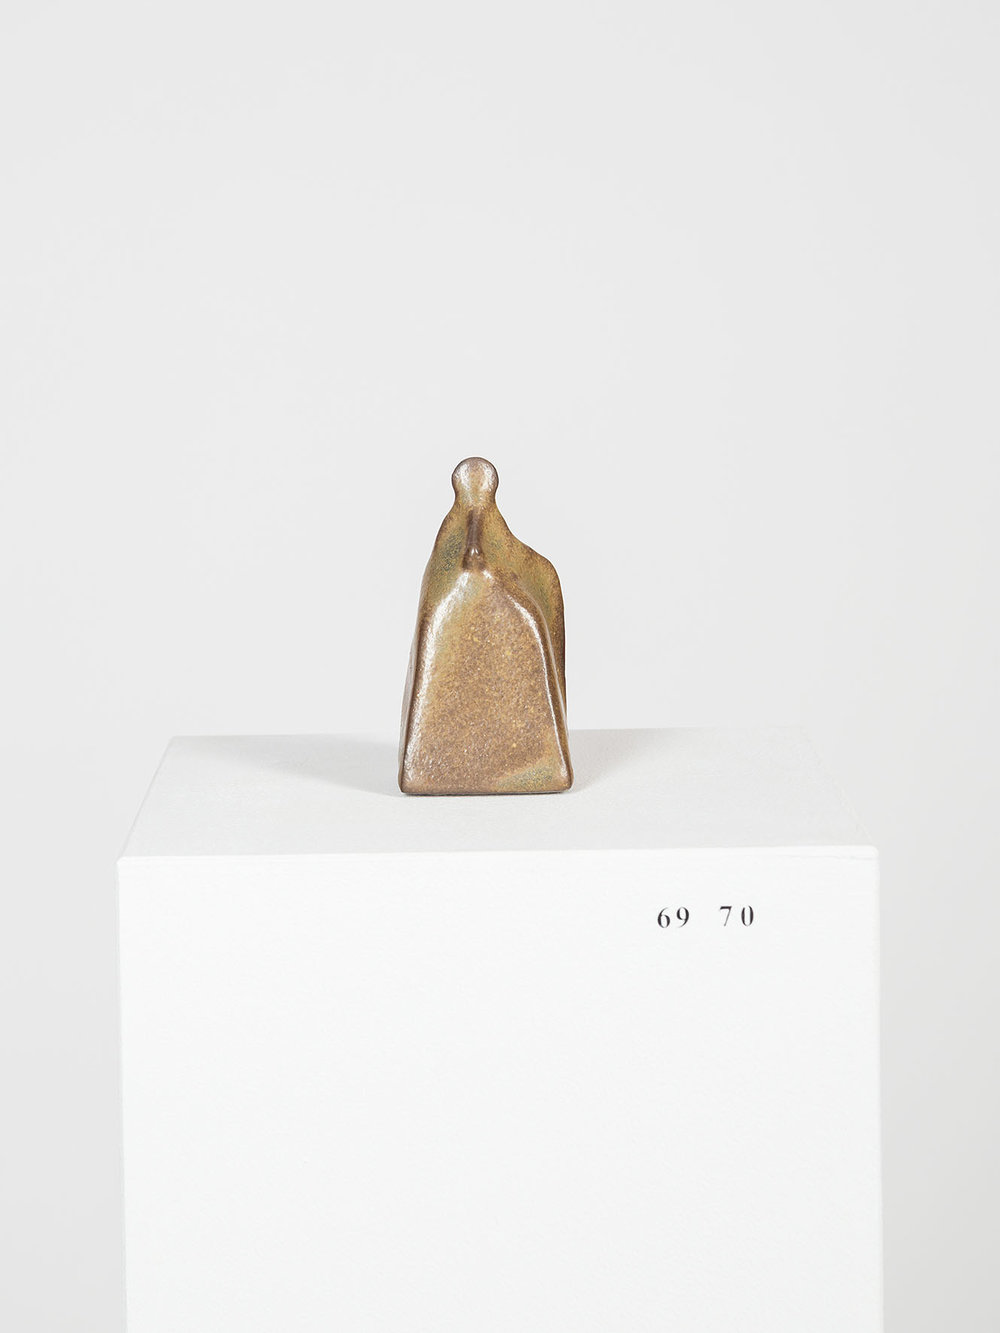 Sanupäerkopf , ca. 1070 v. Chr (frühe Arca Periode)  glazed ceramic  9 × 4 × 5 cm